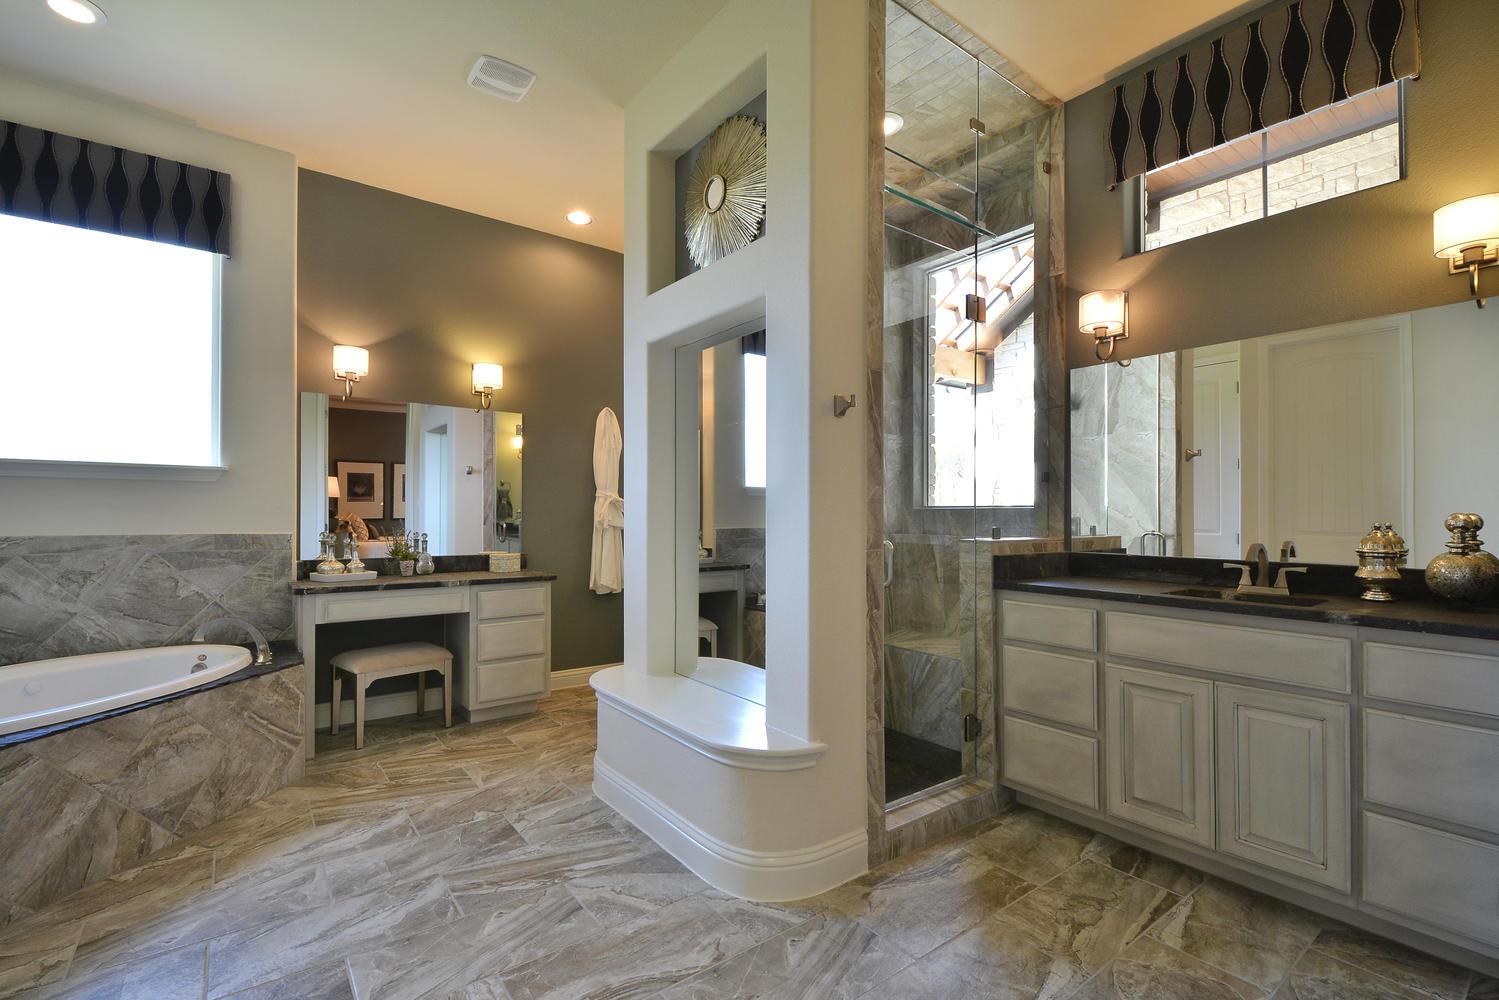 Burrows Cabinets master bath in bone with black glaze